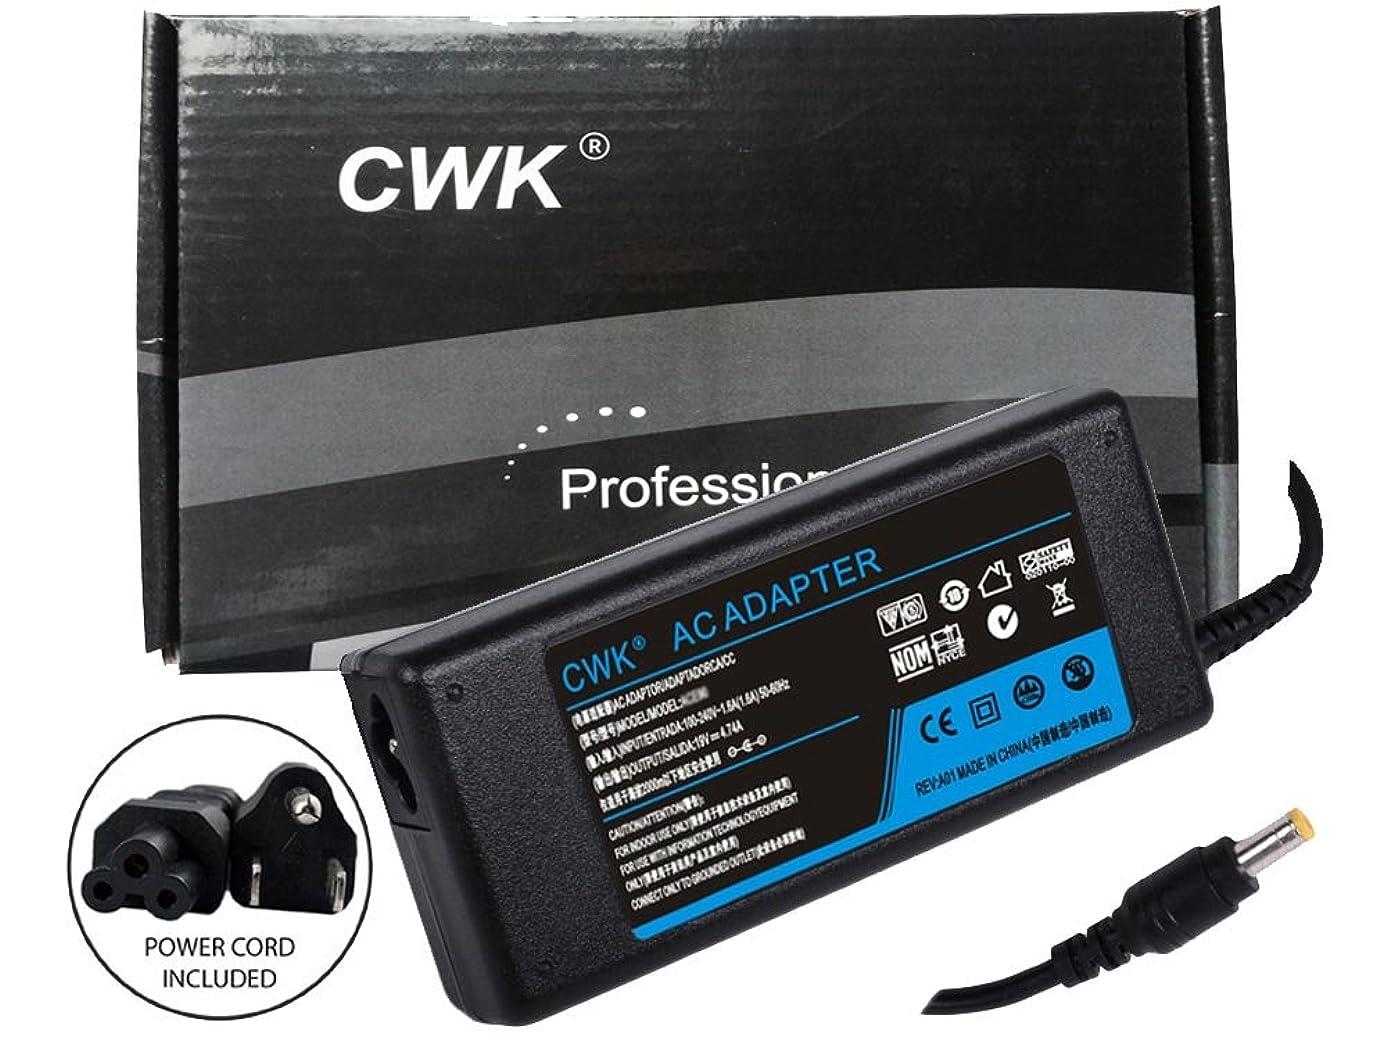 CWK AC Adapter Laptop Charger Power Supply Cord for Acer AP.09001.003 AP.09000.001 PSU C7 Chrome book C710-2847 Google CBD1F4 Travelmate TM4200-4320 TM4200-4323 TM4200-4345 DDFAEB